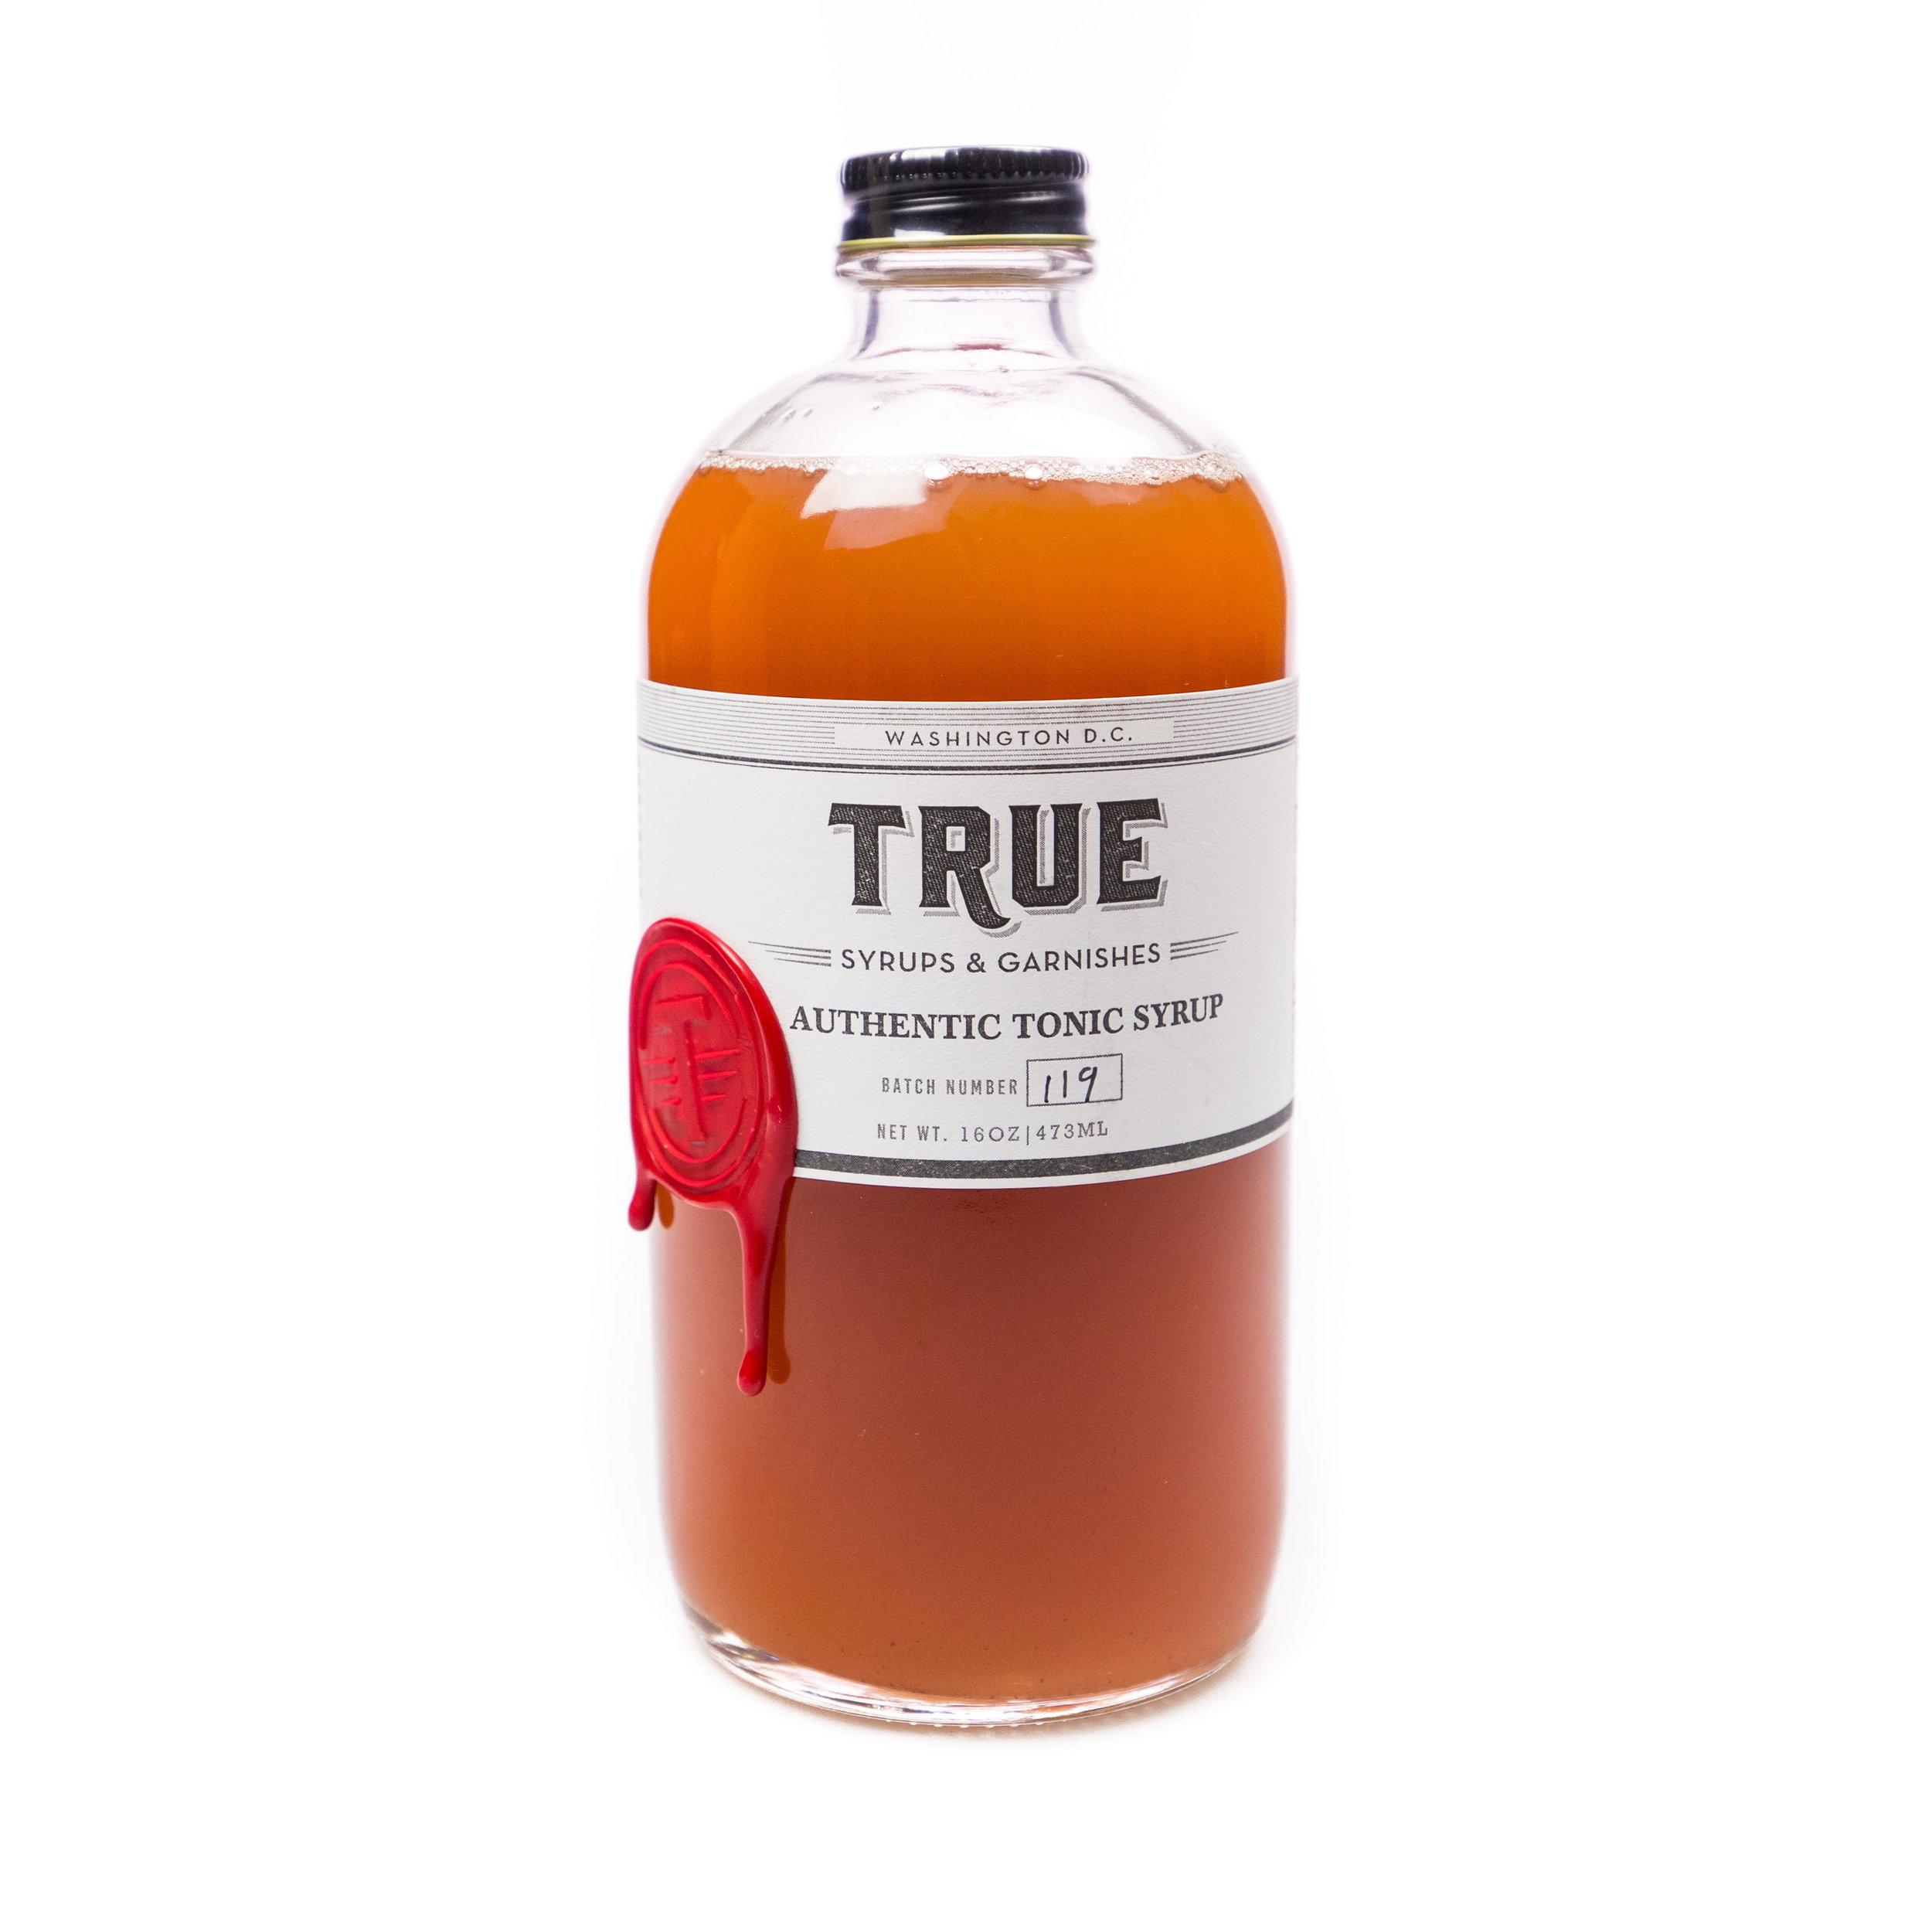 True Syrups & Garnishes